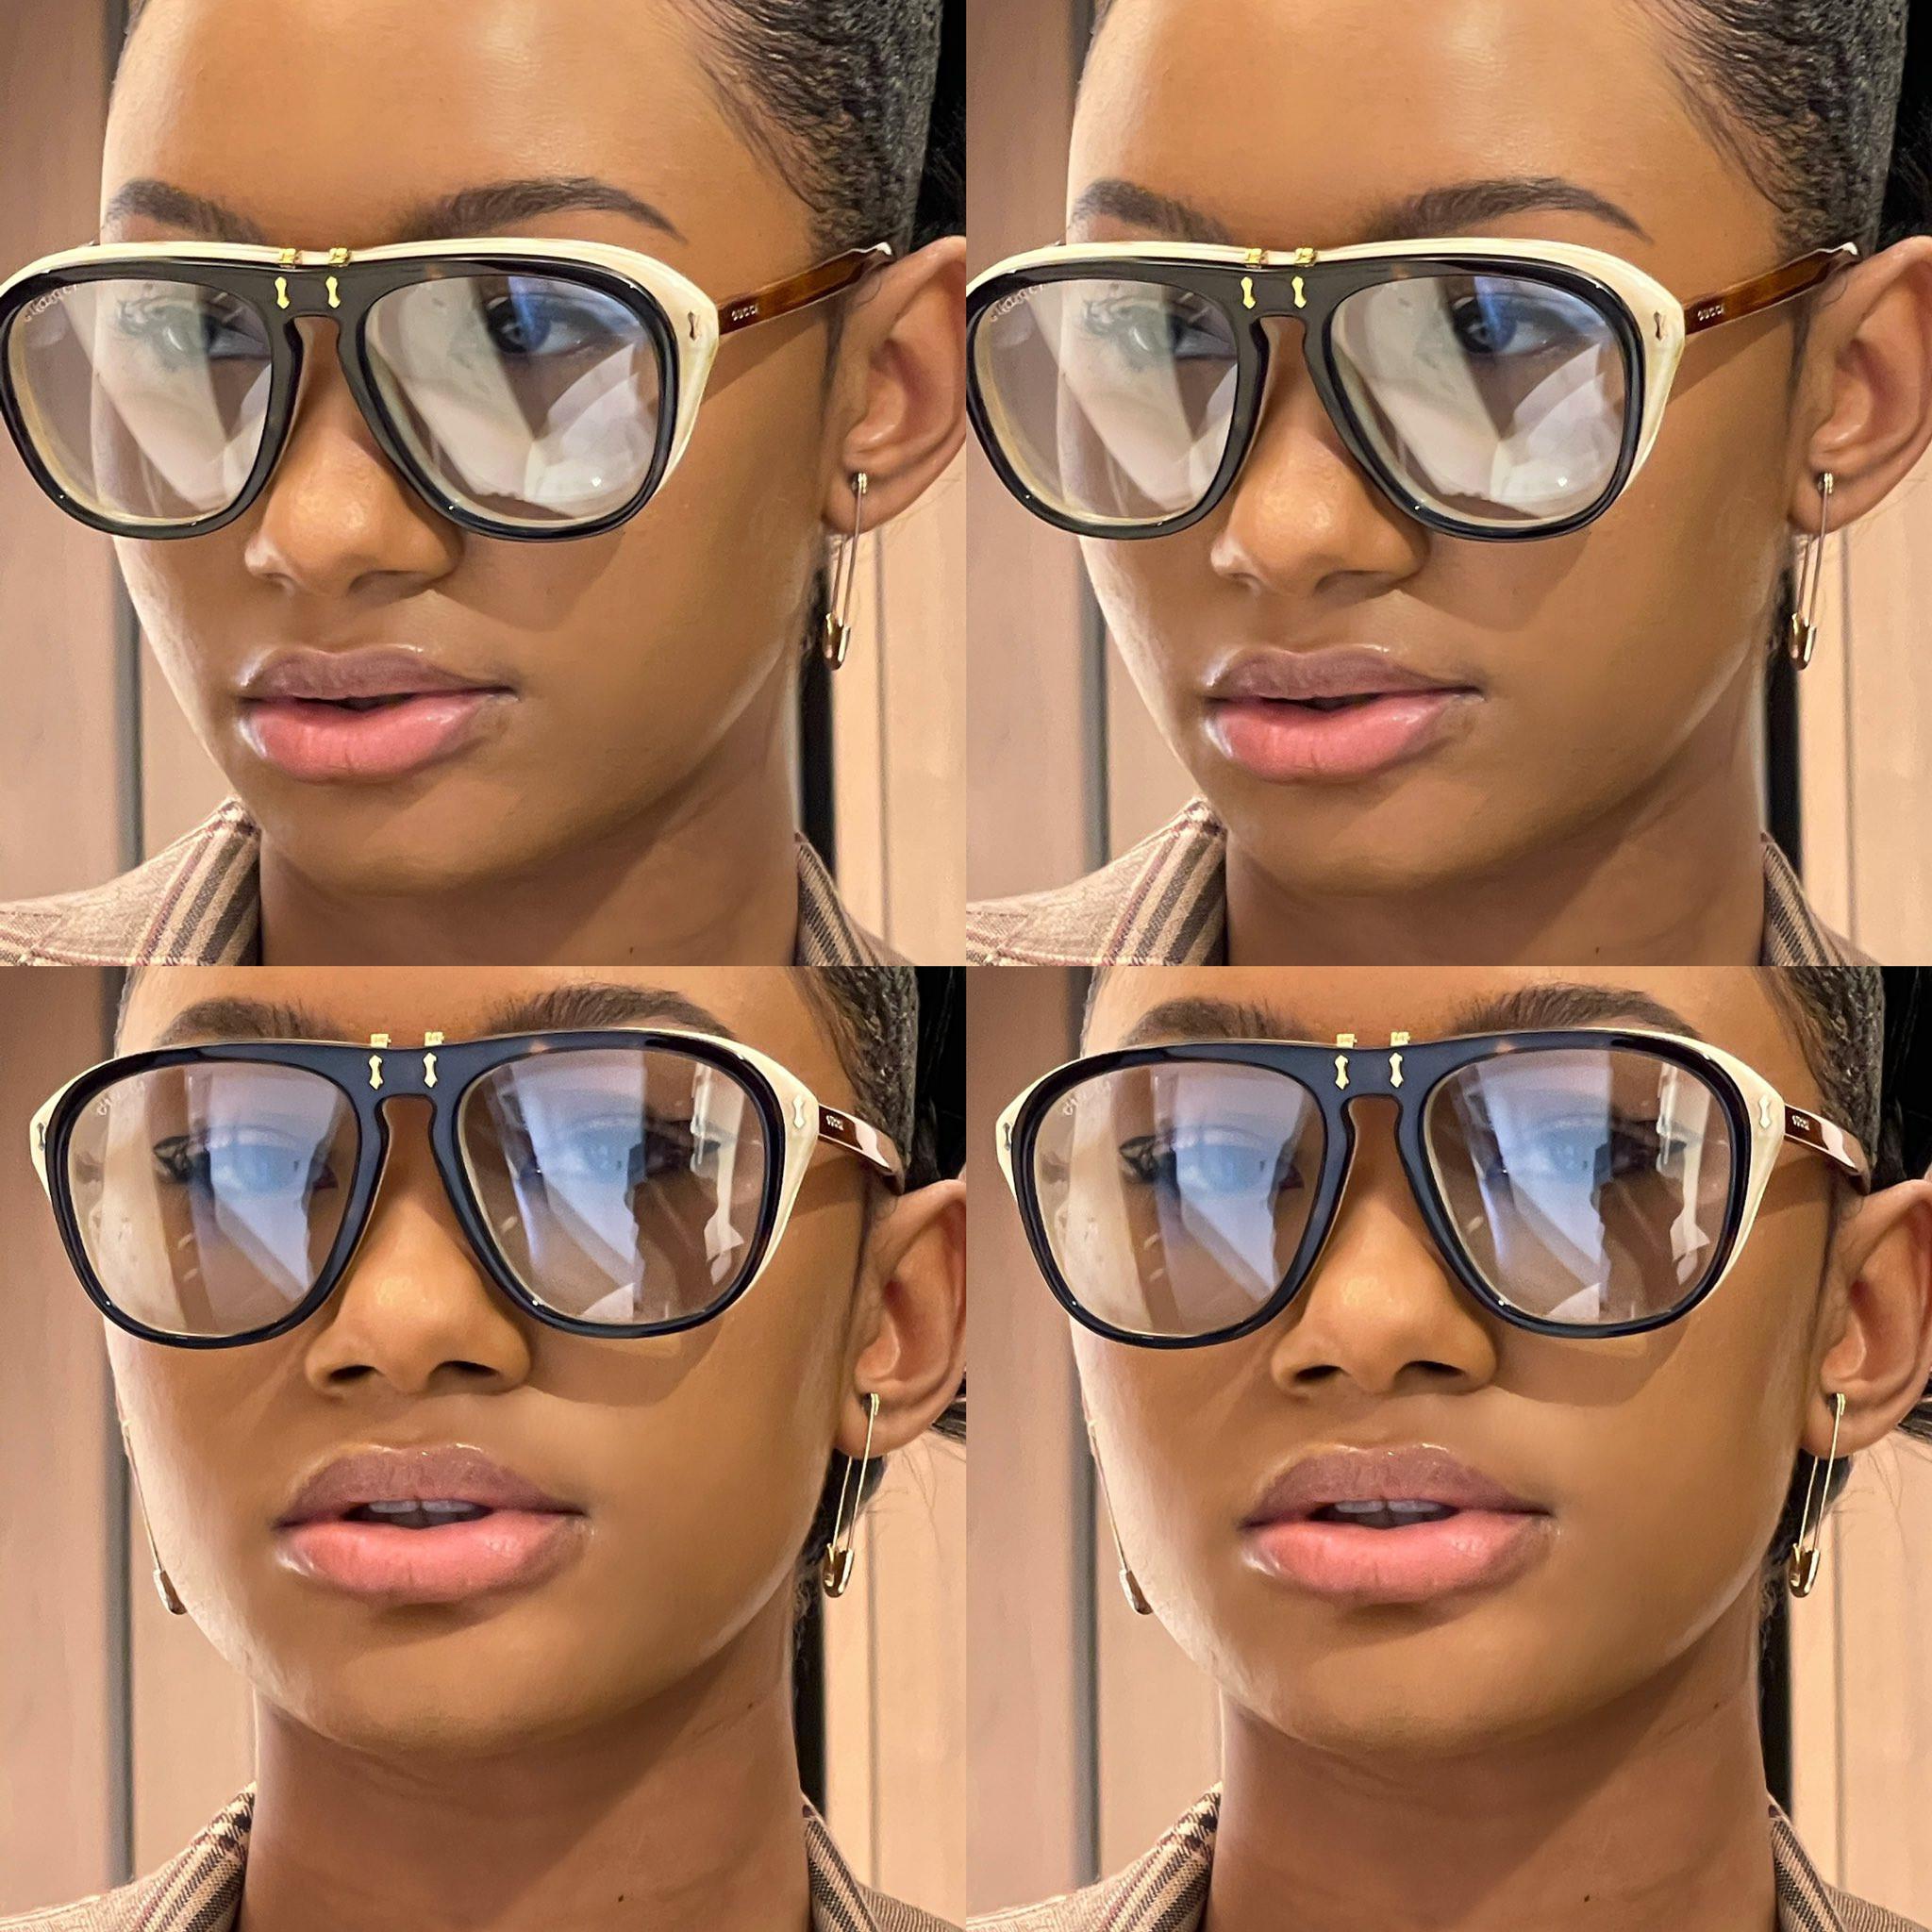 Temi Otedola rocks 14 Karat Gold Safety Pin earrings worth N114K in new photos lindaikejisblog 1